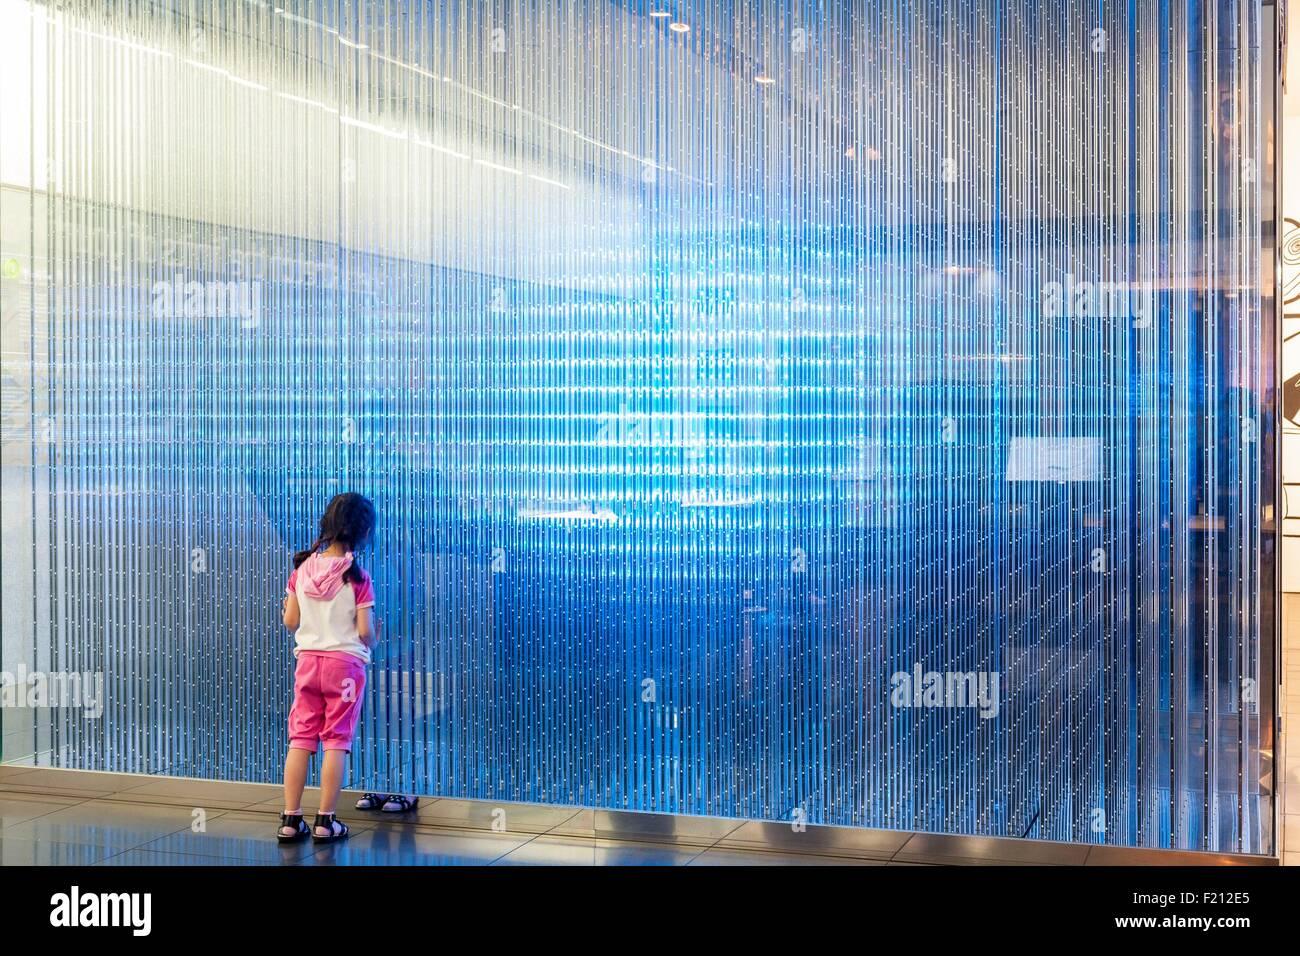 La Corée du Sud, Séoul, Seocho-gu, Samsung Iight, showroom de la marque coréenne Samsung Photo Stock